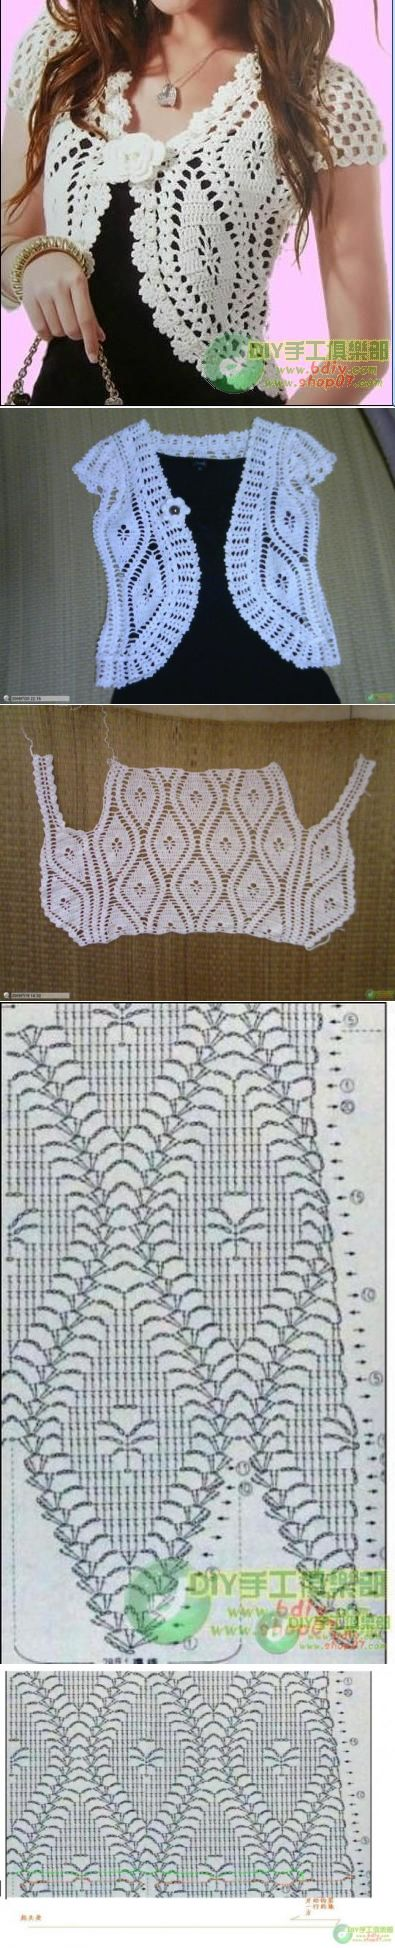 Mejores 296 imágenes de blusas en crochet en Pinterest   Costura ...